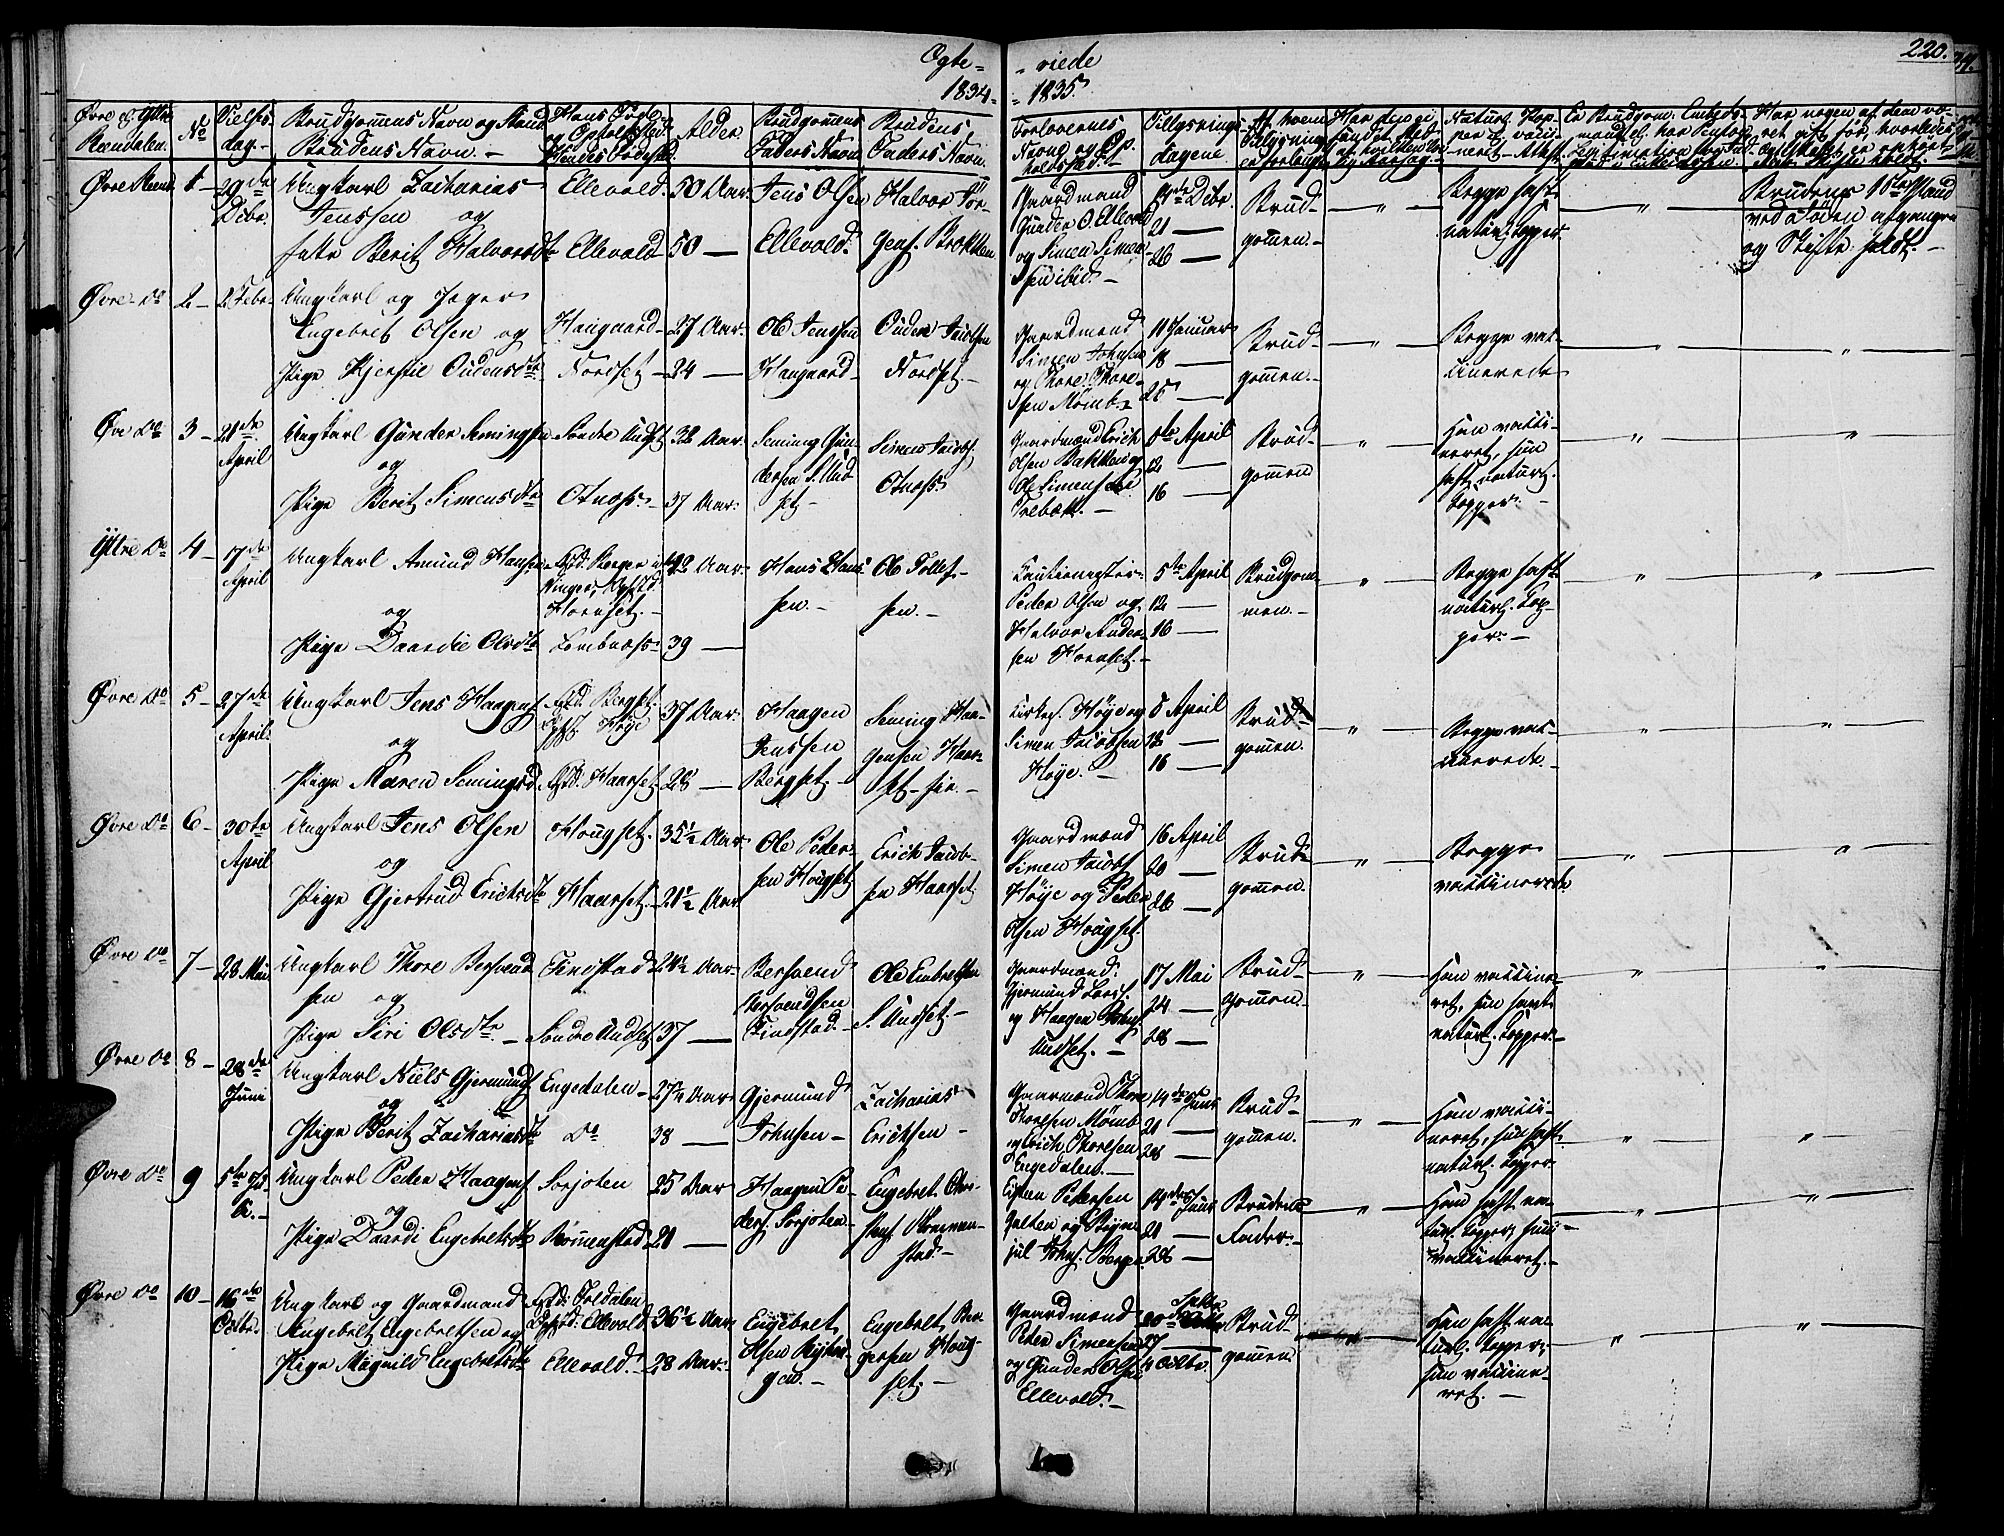 SAH, Rendalen prestekontor, H/Ha/Haa/L0004: Ministerialbok nr. 4, 1829-1852, s. 220